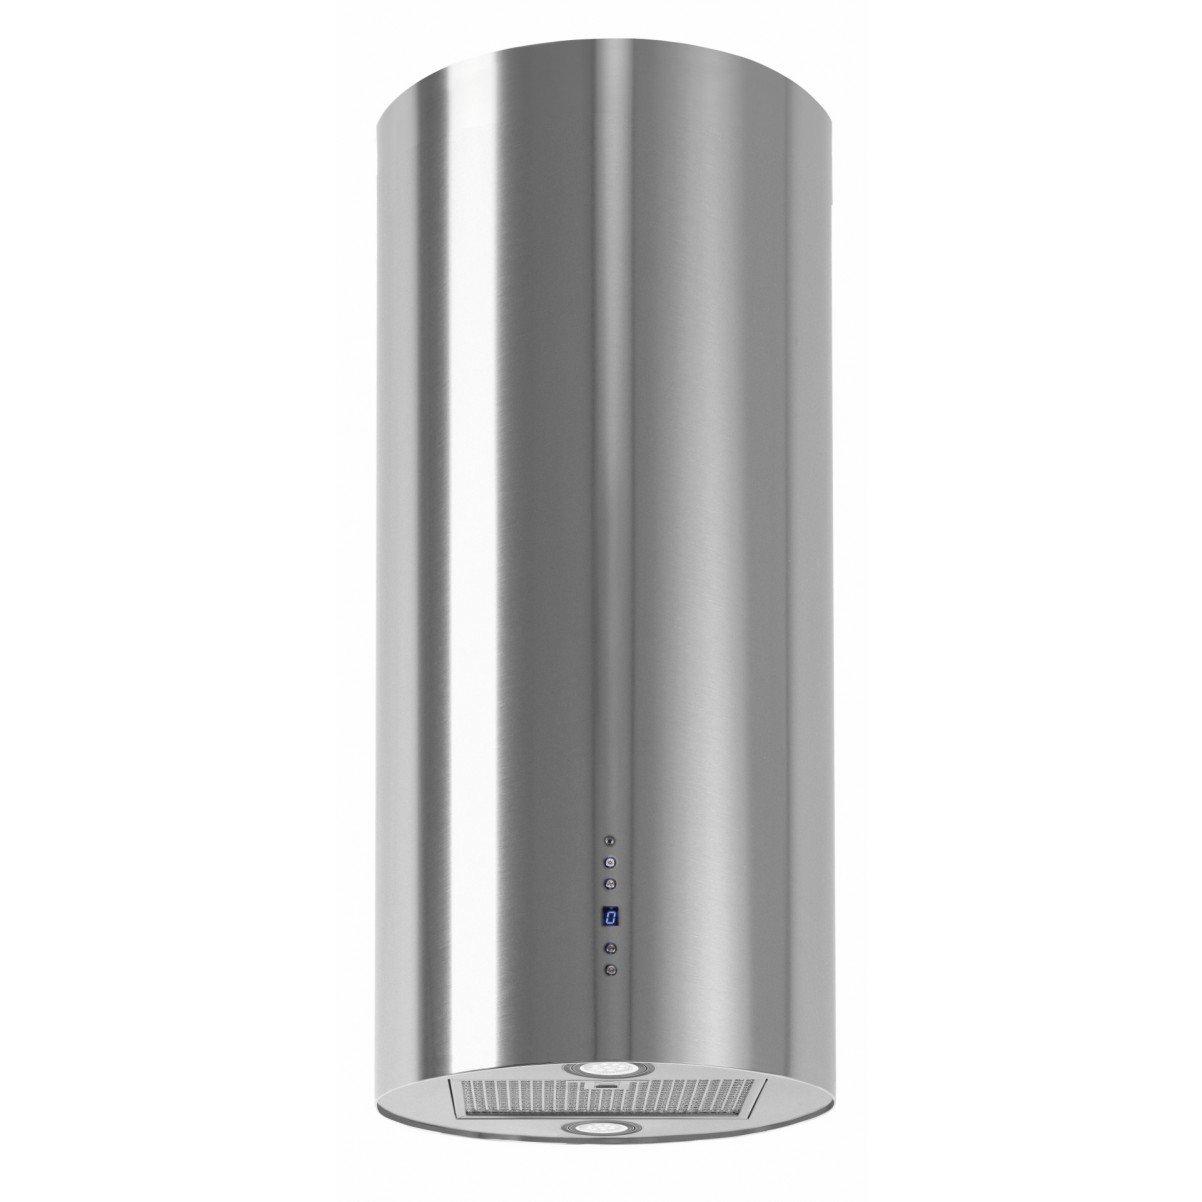 Design frihängande cylinderformad köksfläkt Explorer rostfri